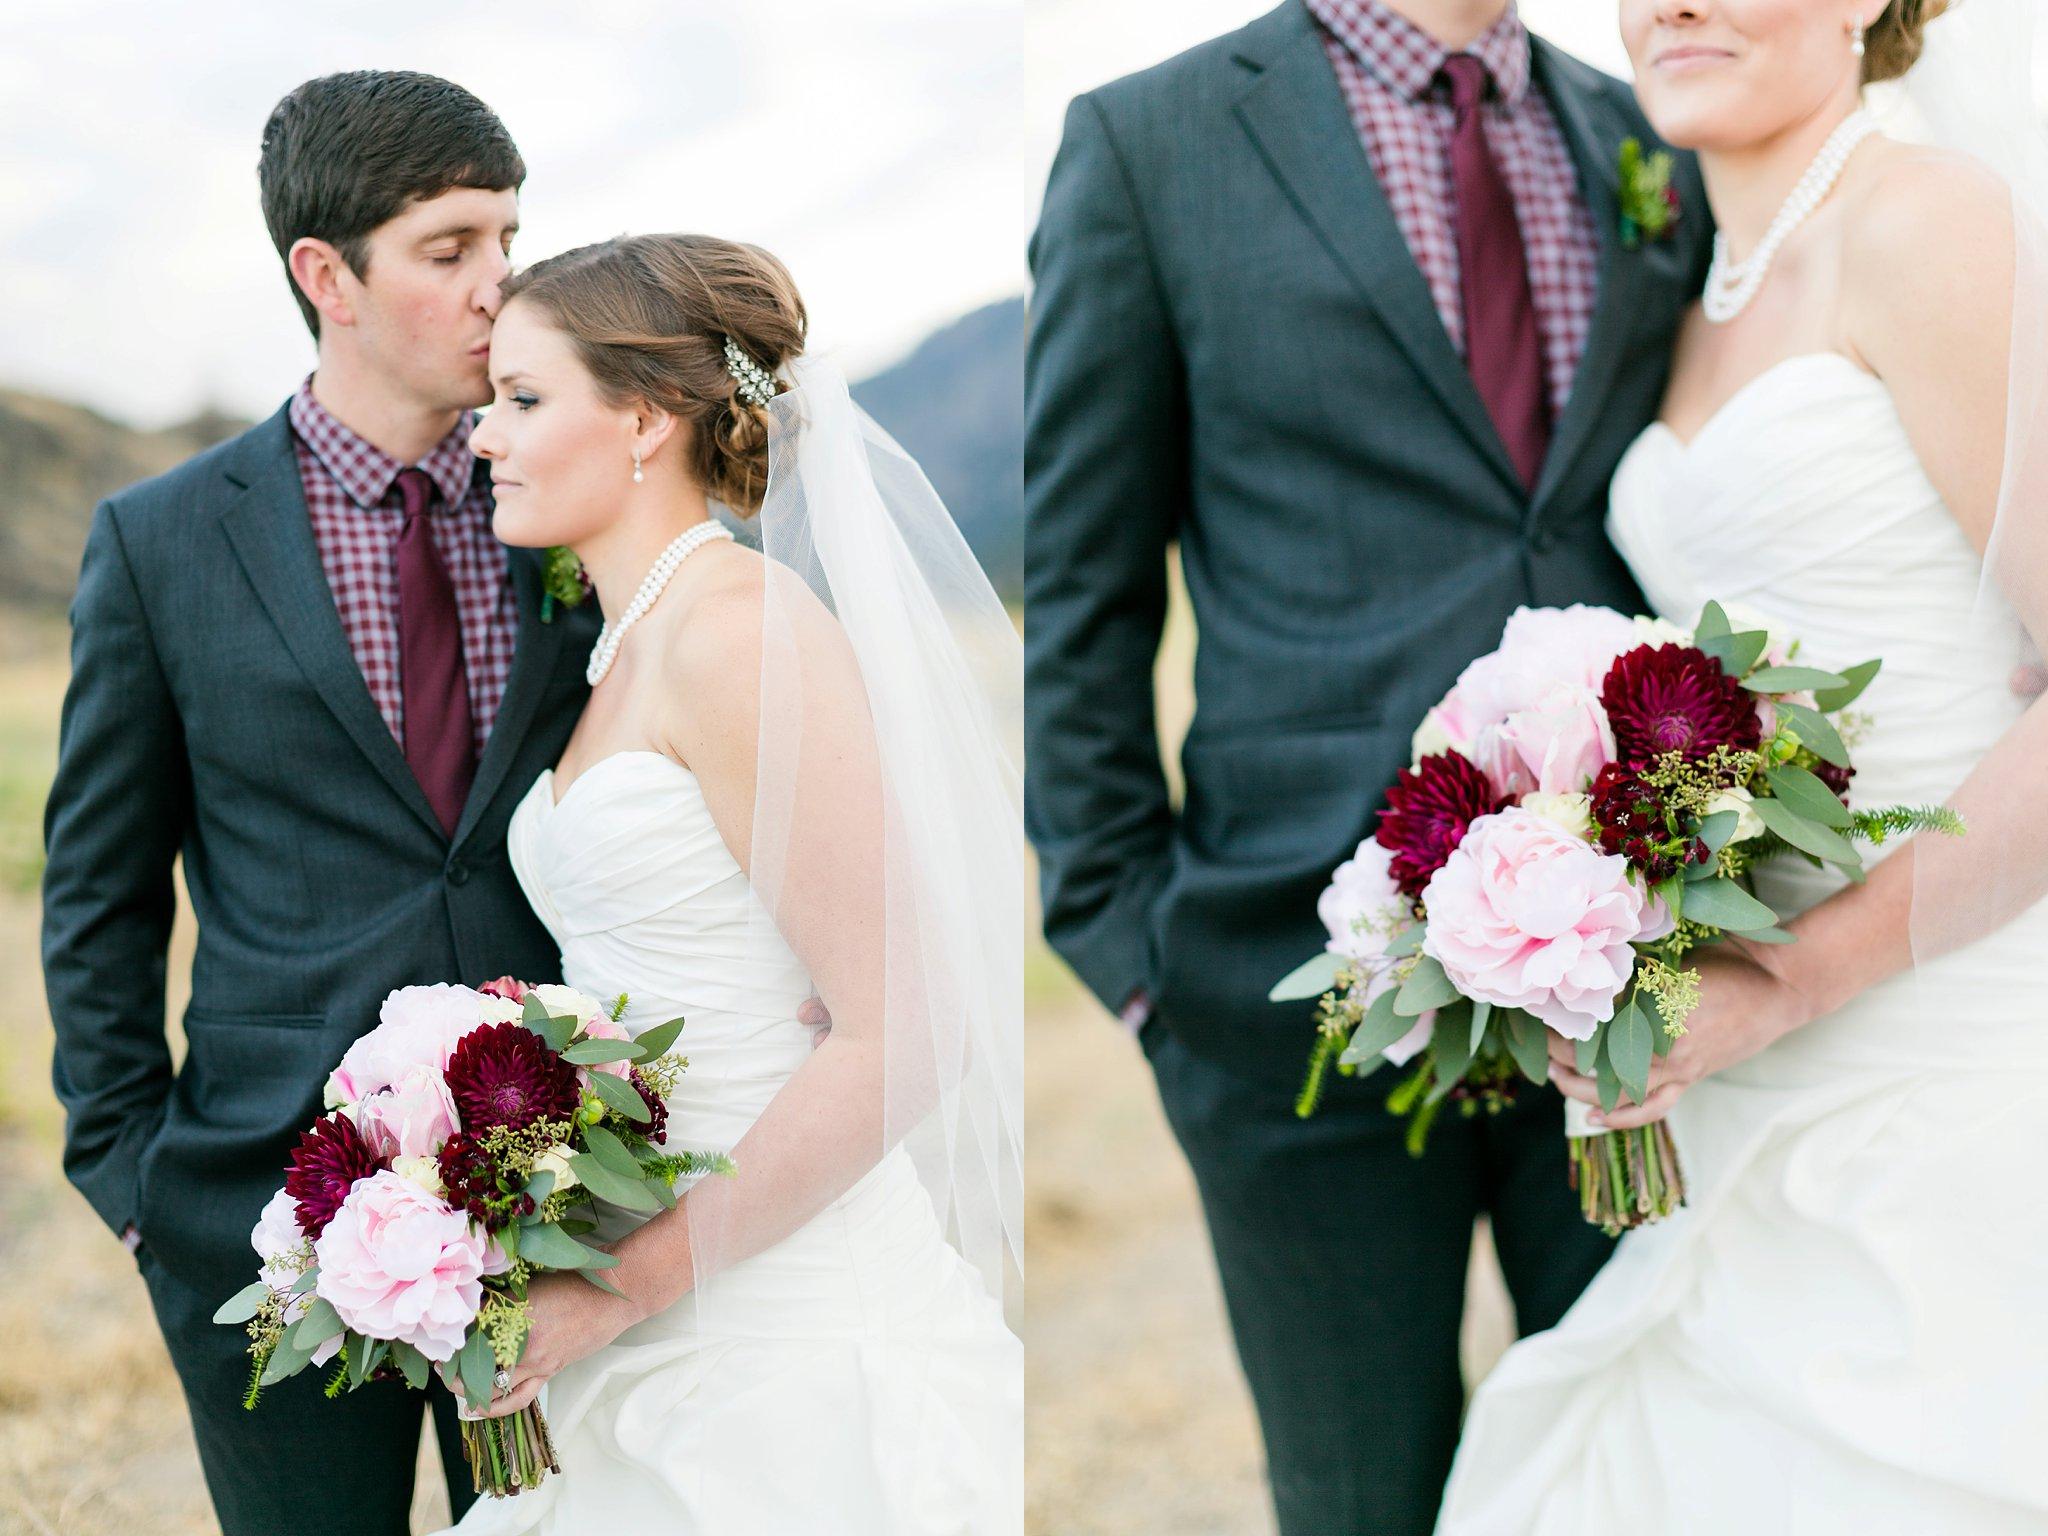 Chelan Washington Wedding Photos Megan Kelsey Photography Delight Wedding Workshop Styled Shoot Annalee & Scot-231.jpg